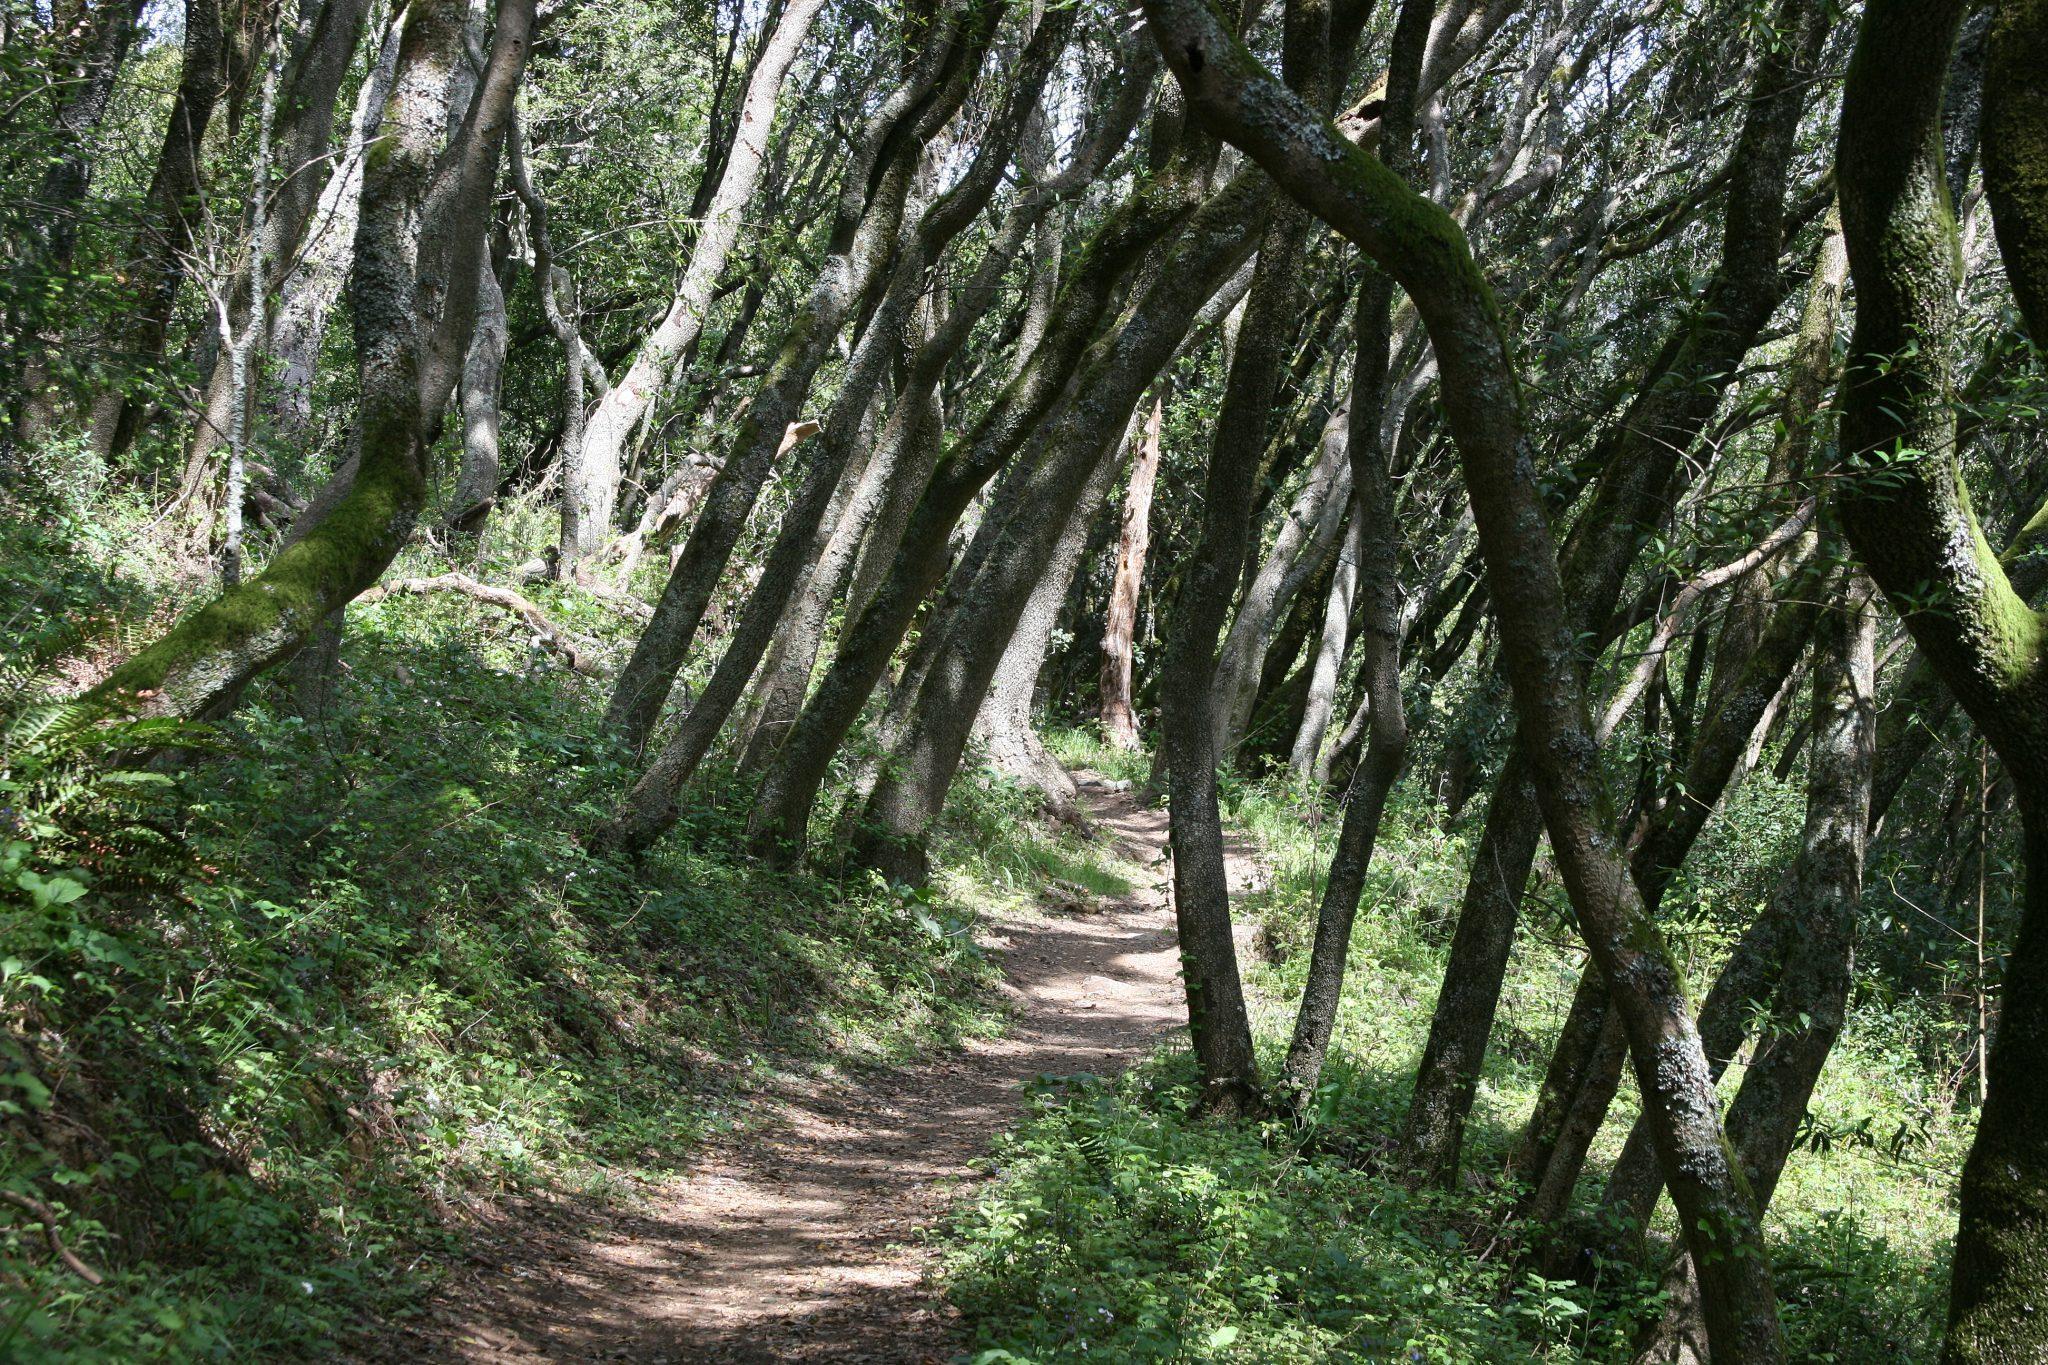 A tree tunnel on the Coastal Trail on Mount Tamalpais